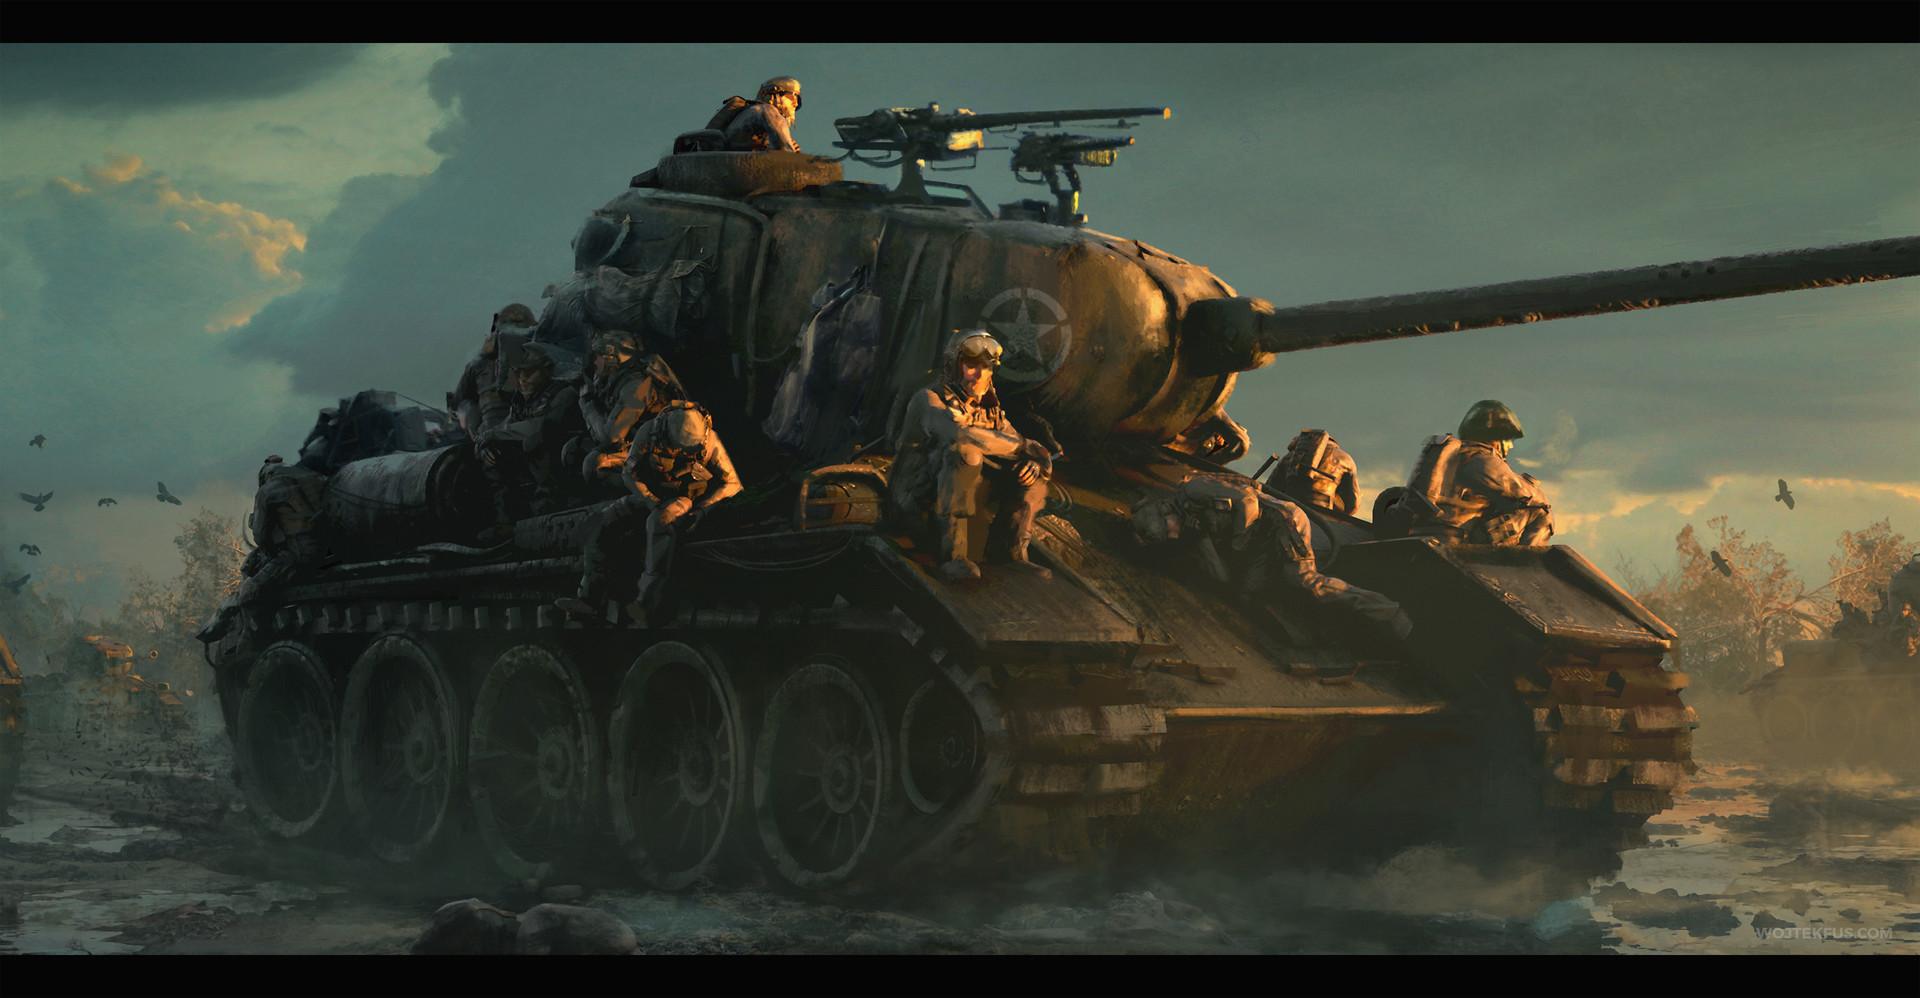 Wojtek fus tank2zoom